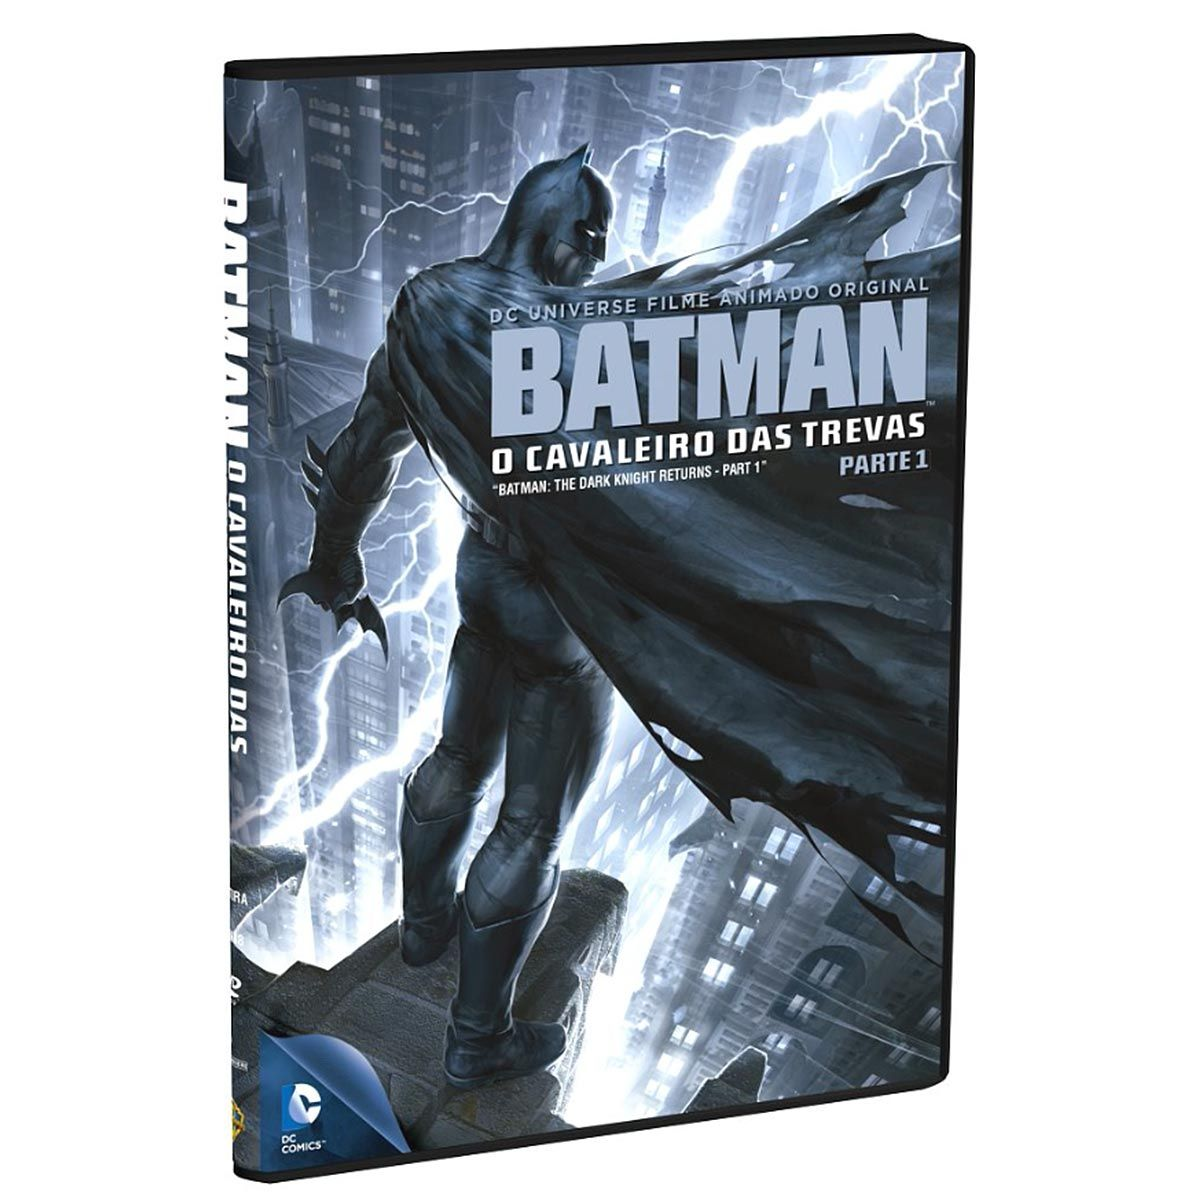 Dvd Batman Cavaleiro Das Trevas Parte 1 Batman The Dark Knight